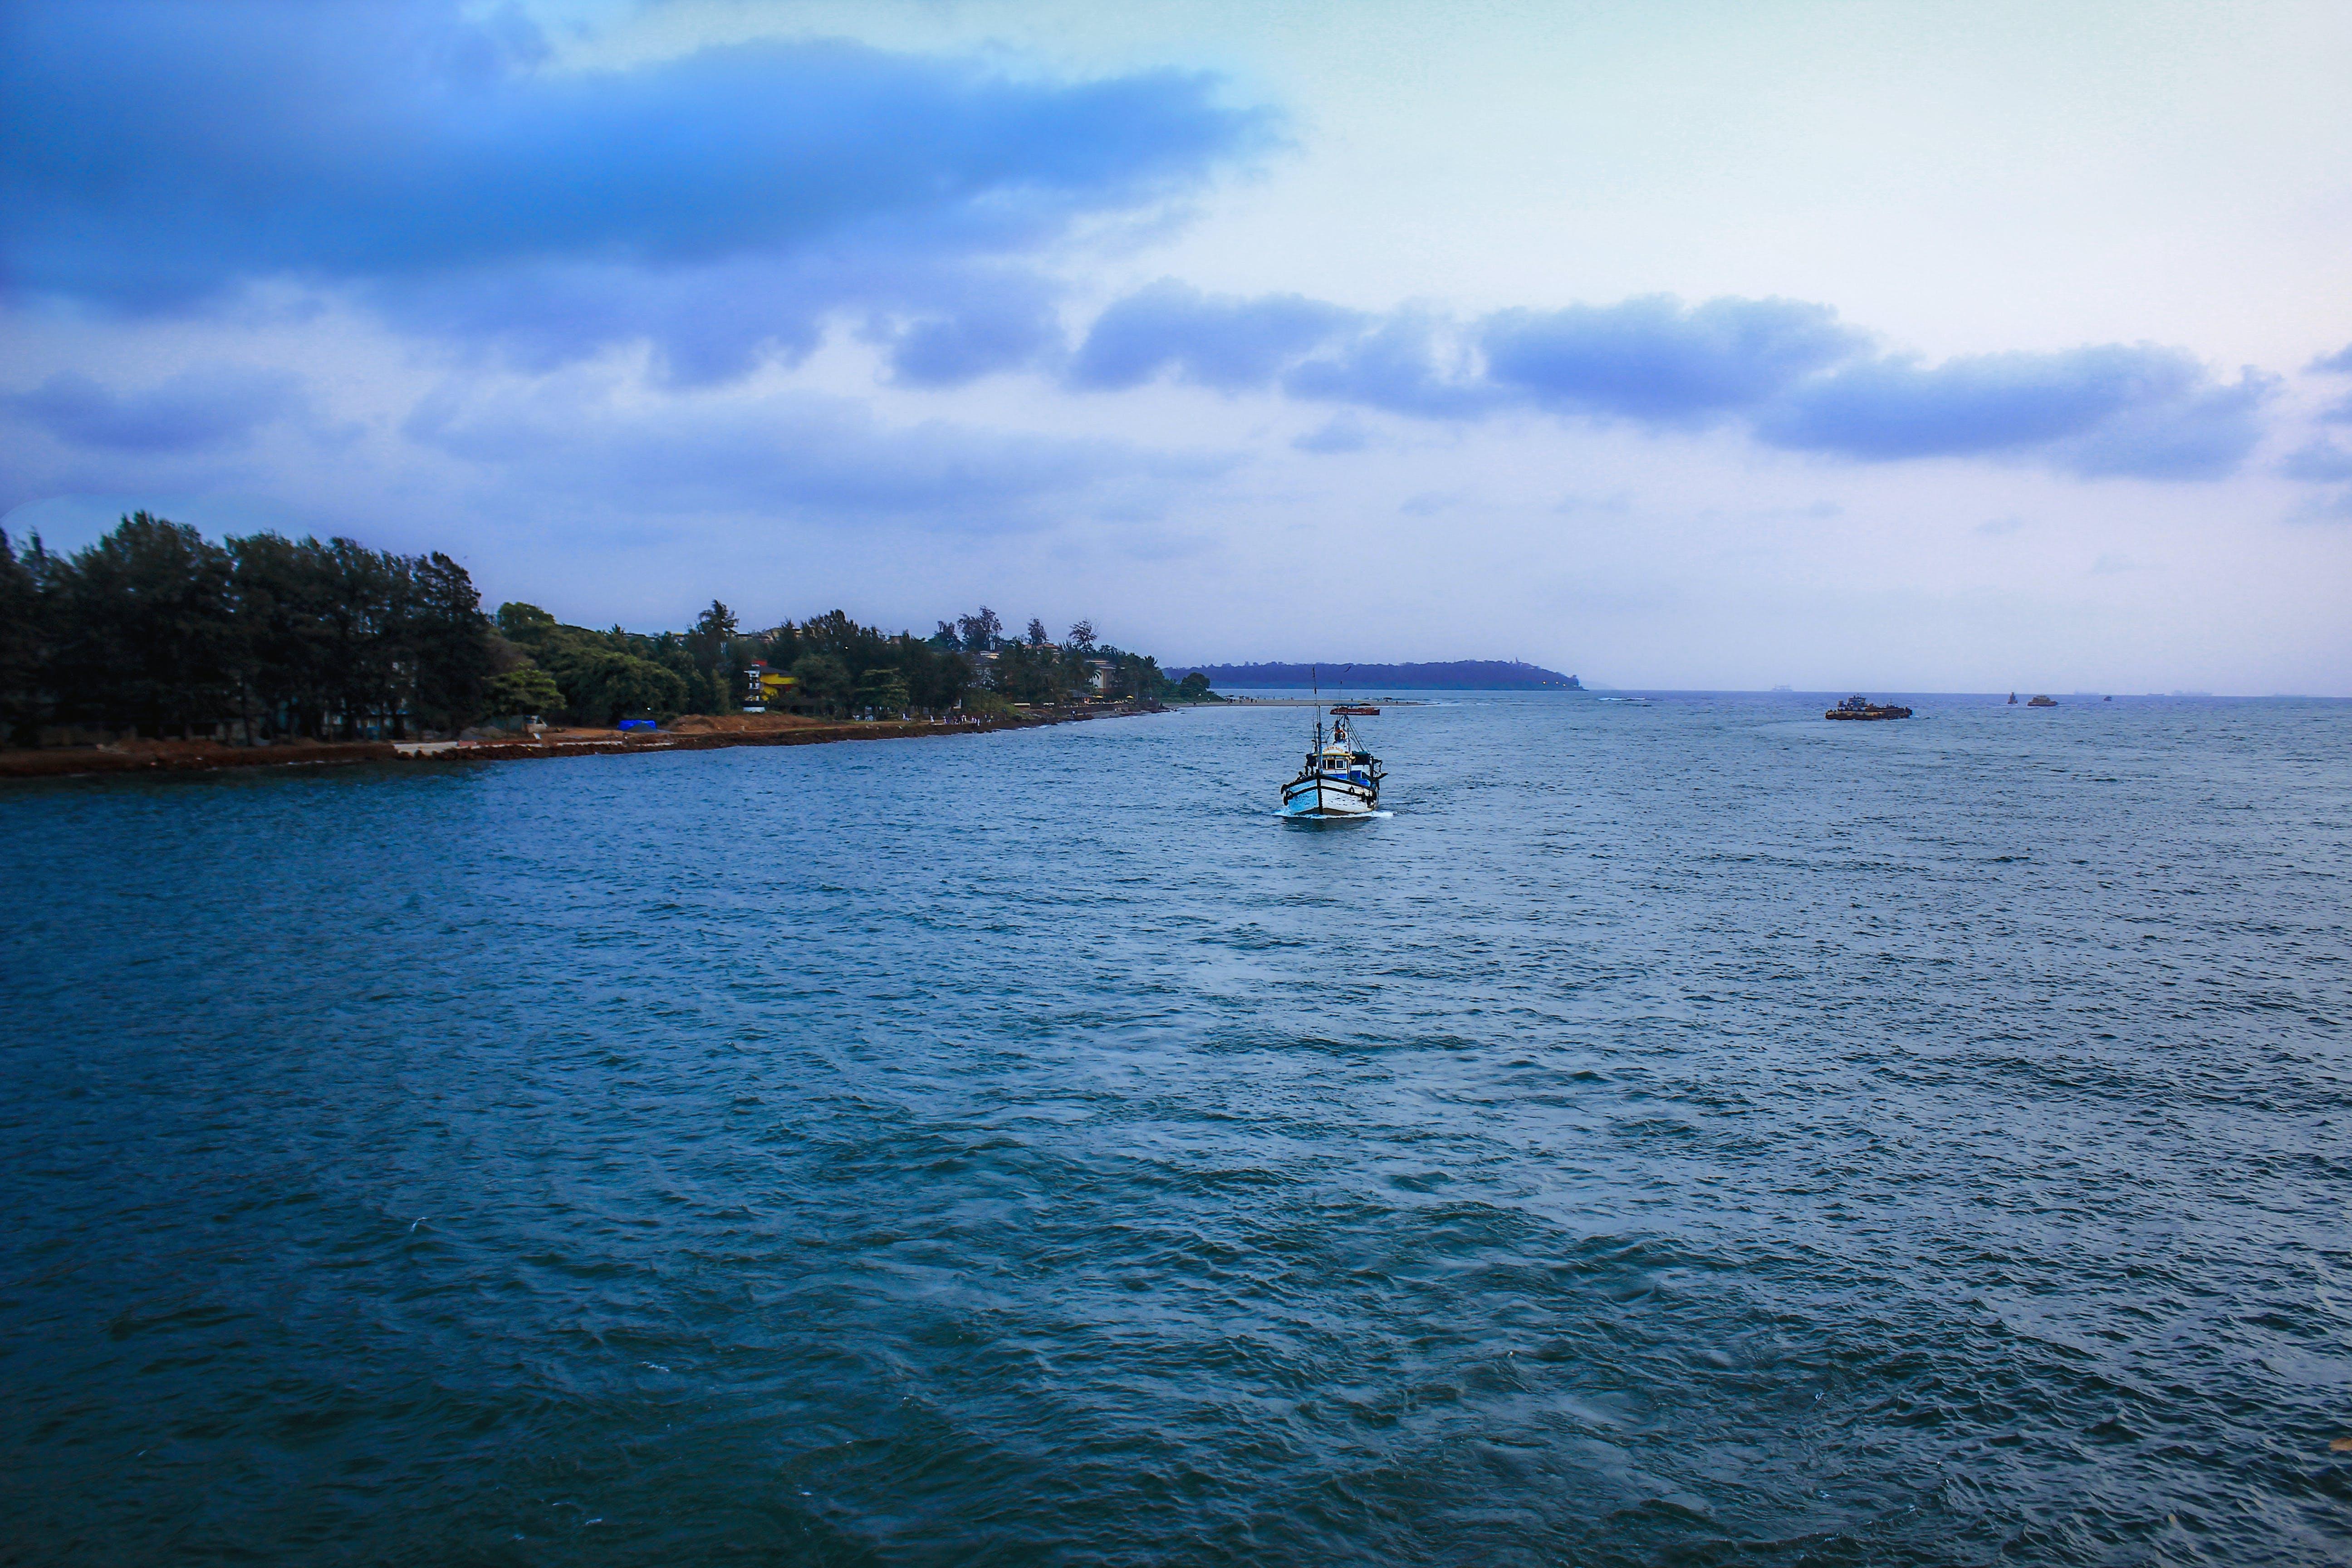 beach, blue water, cloud